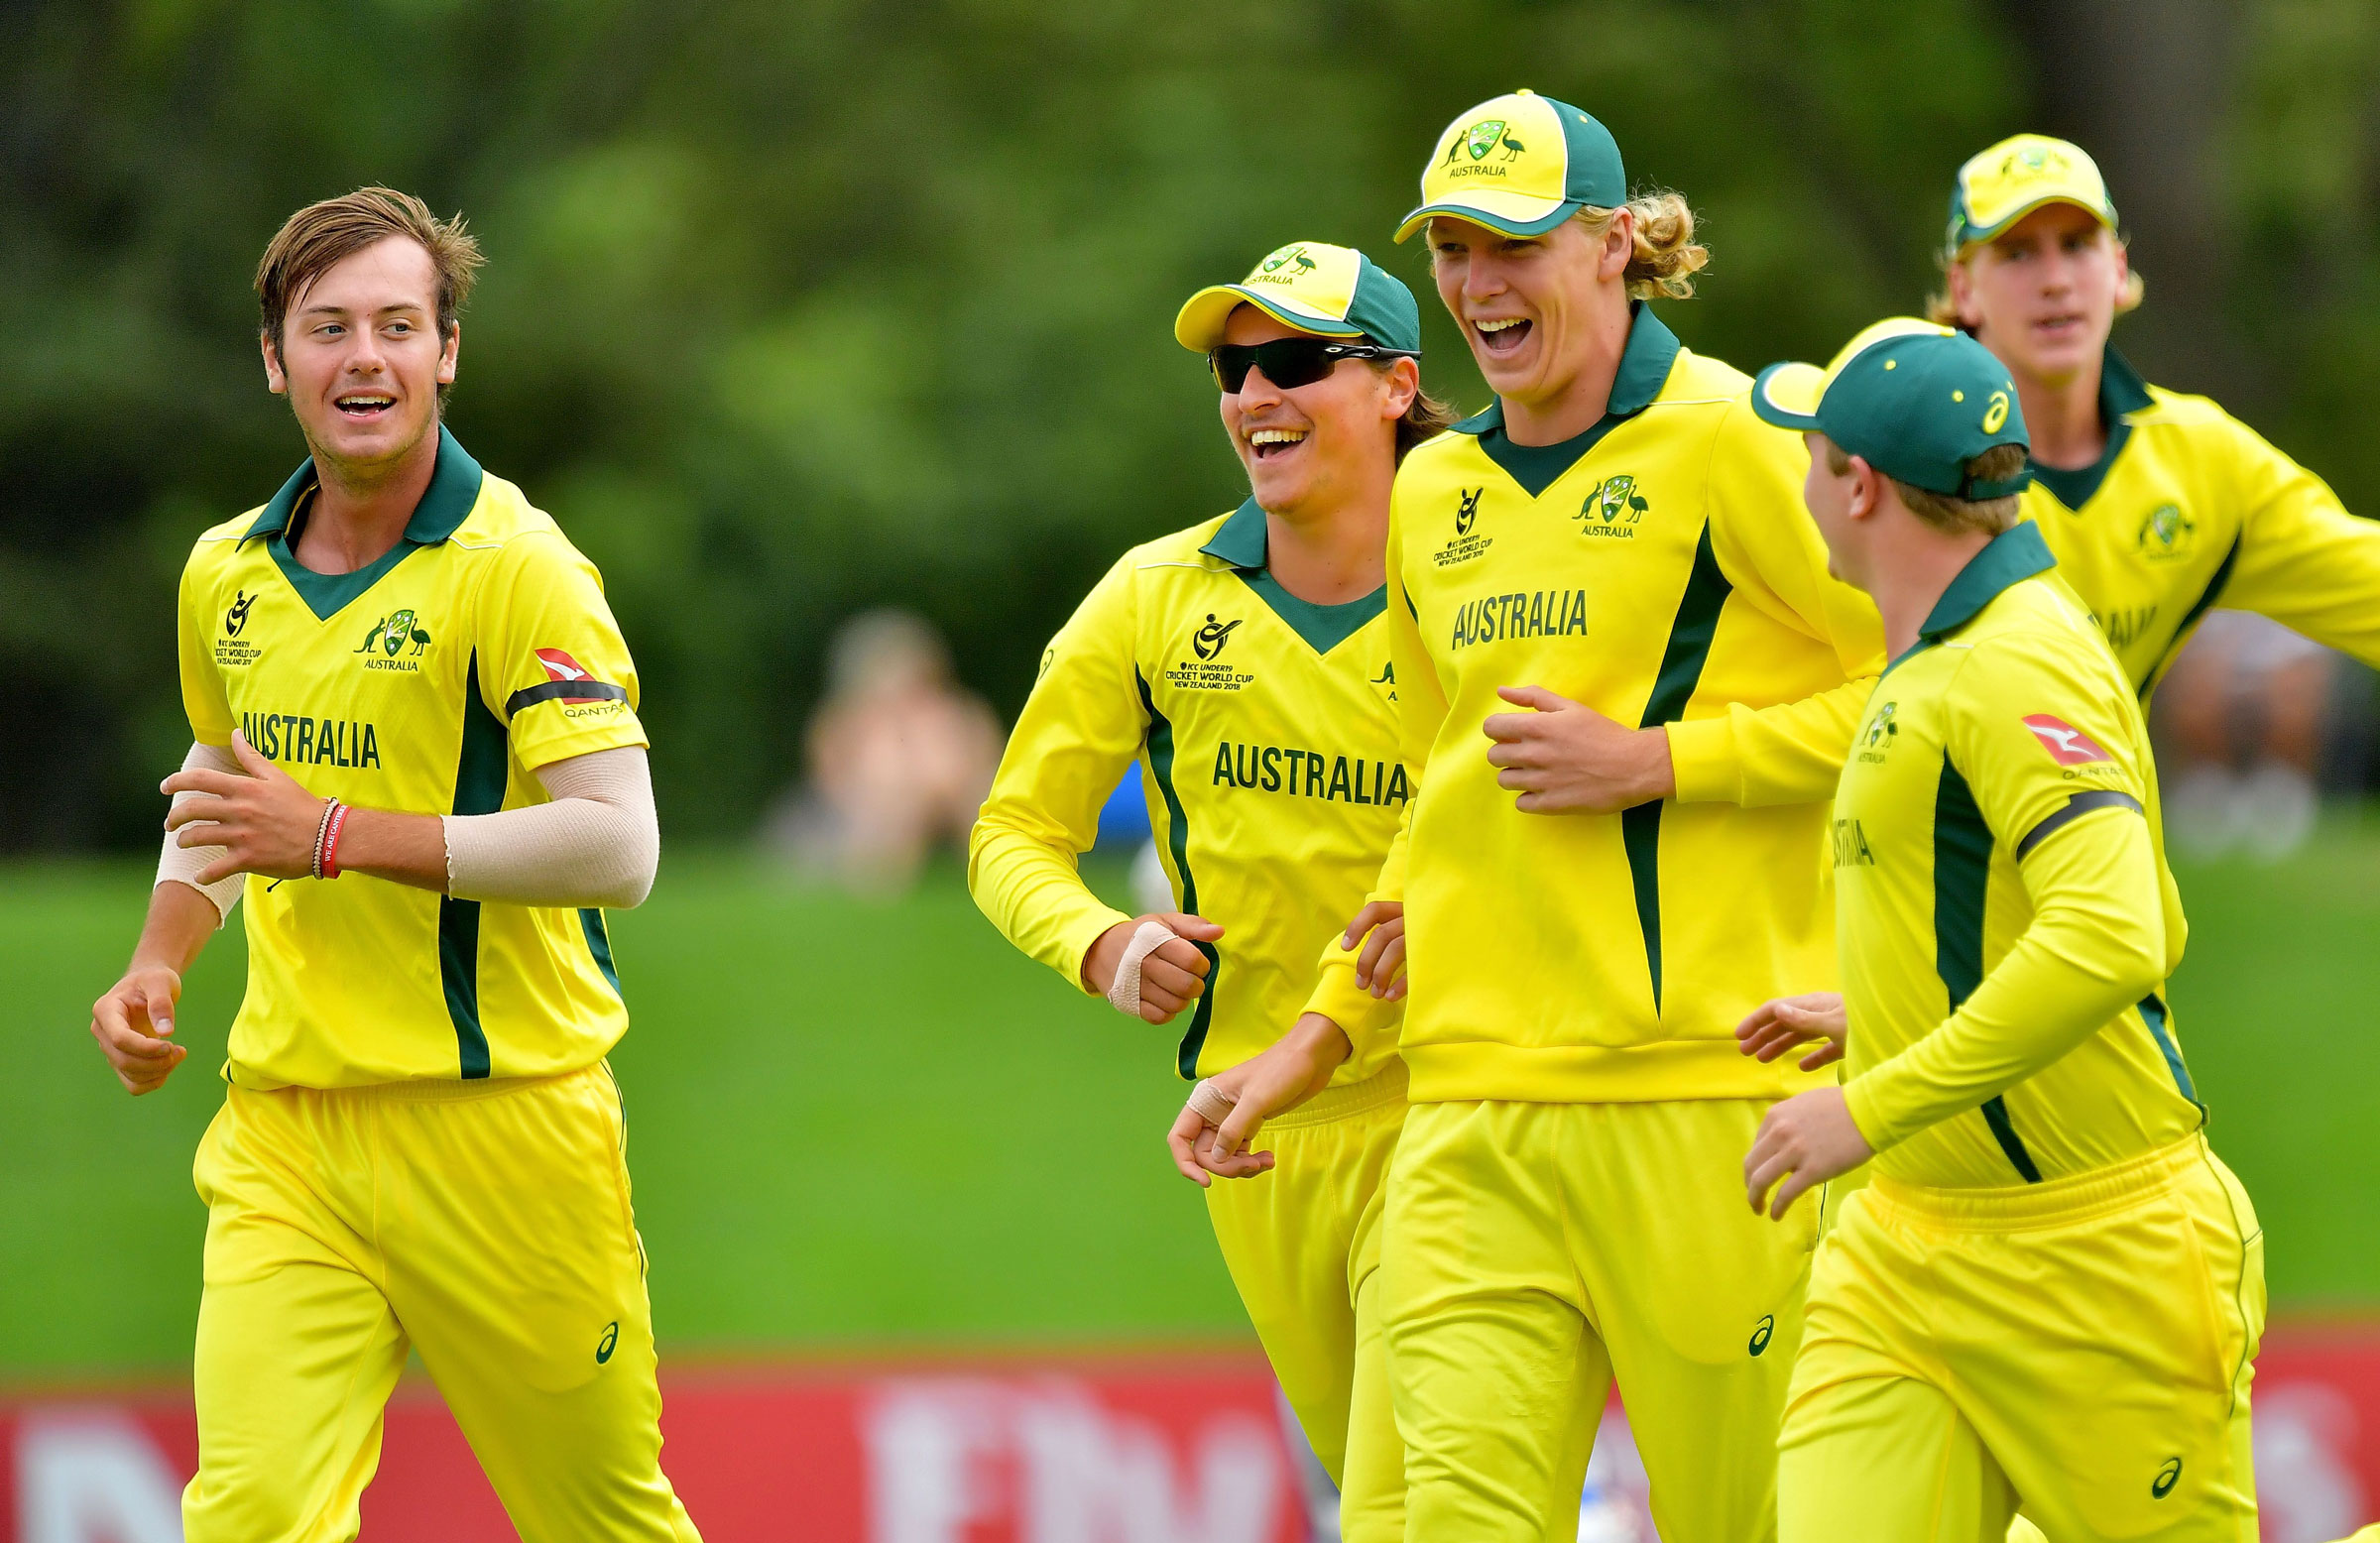 Australia thump Nigeria at Under-19 Cricket World Cup - Sports Leo